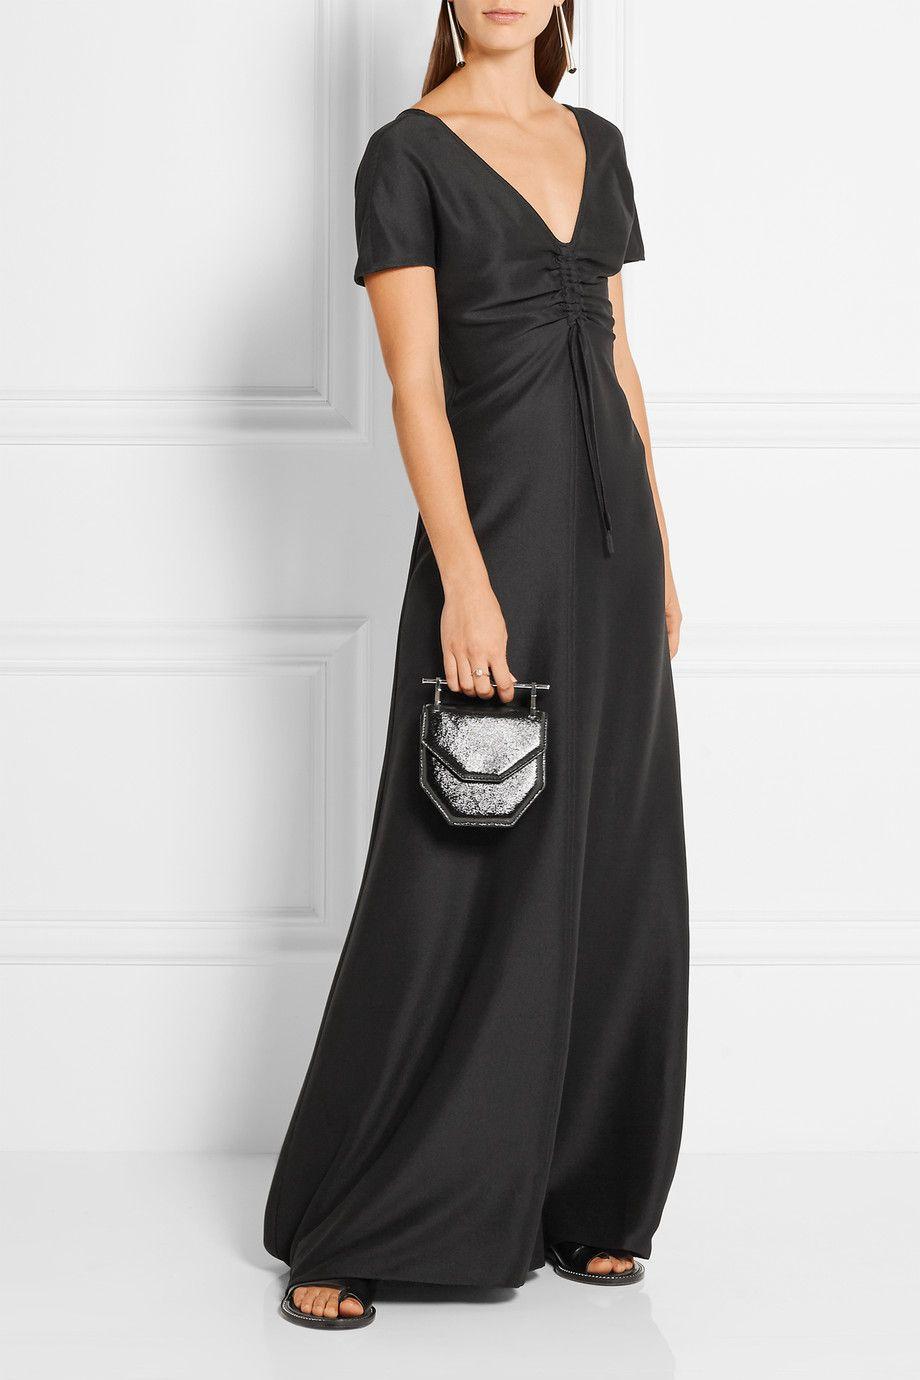 Barbara casasola silk crepe de chine maxi dress a modern